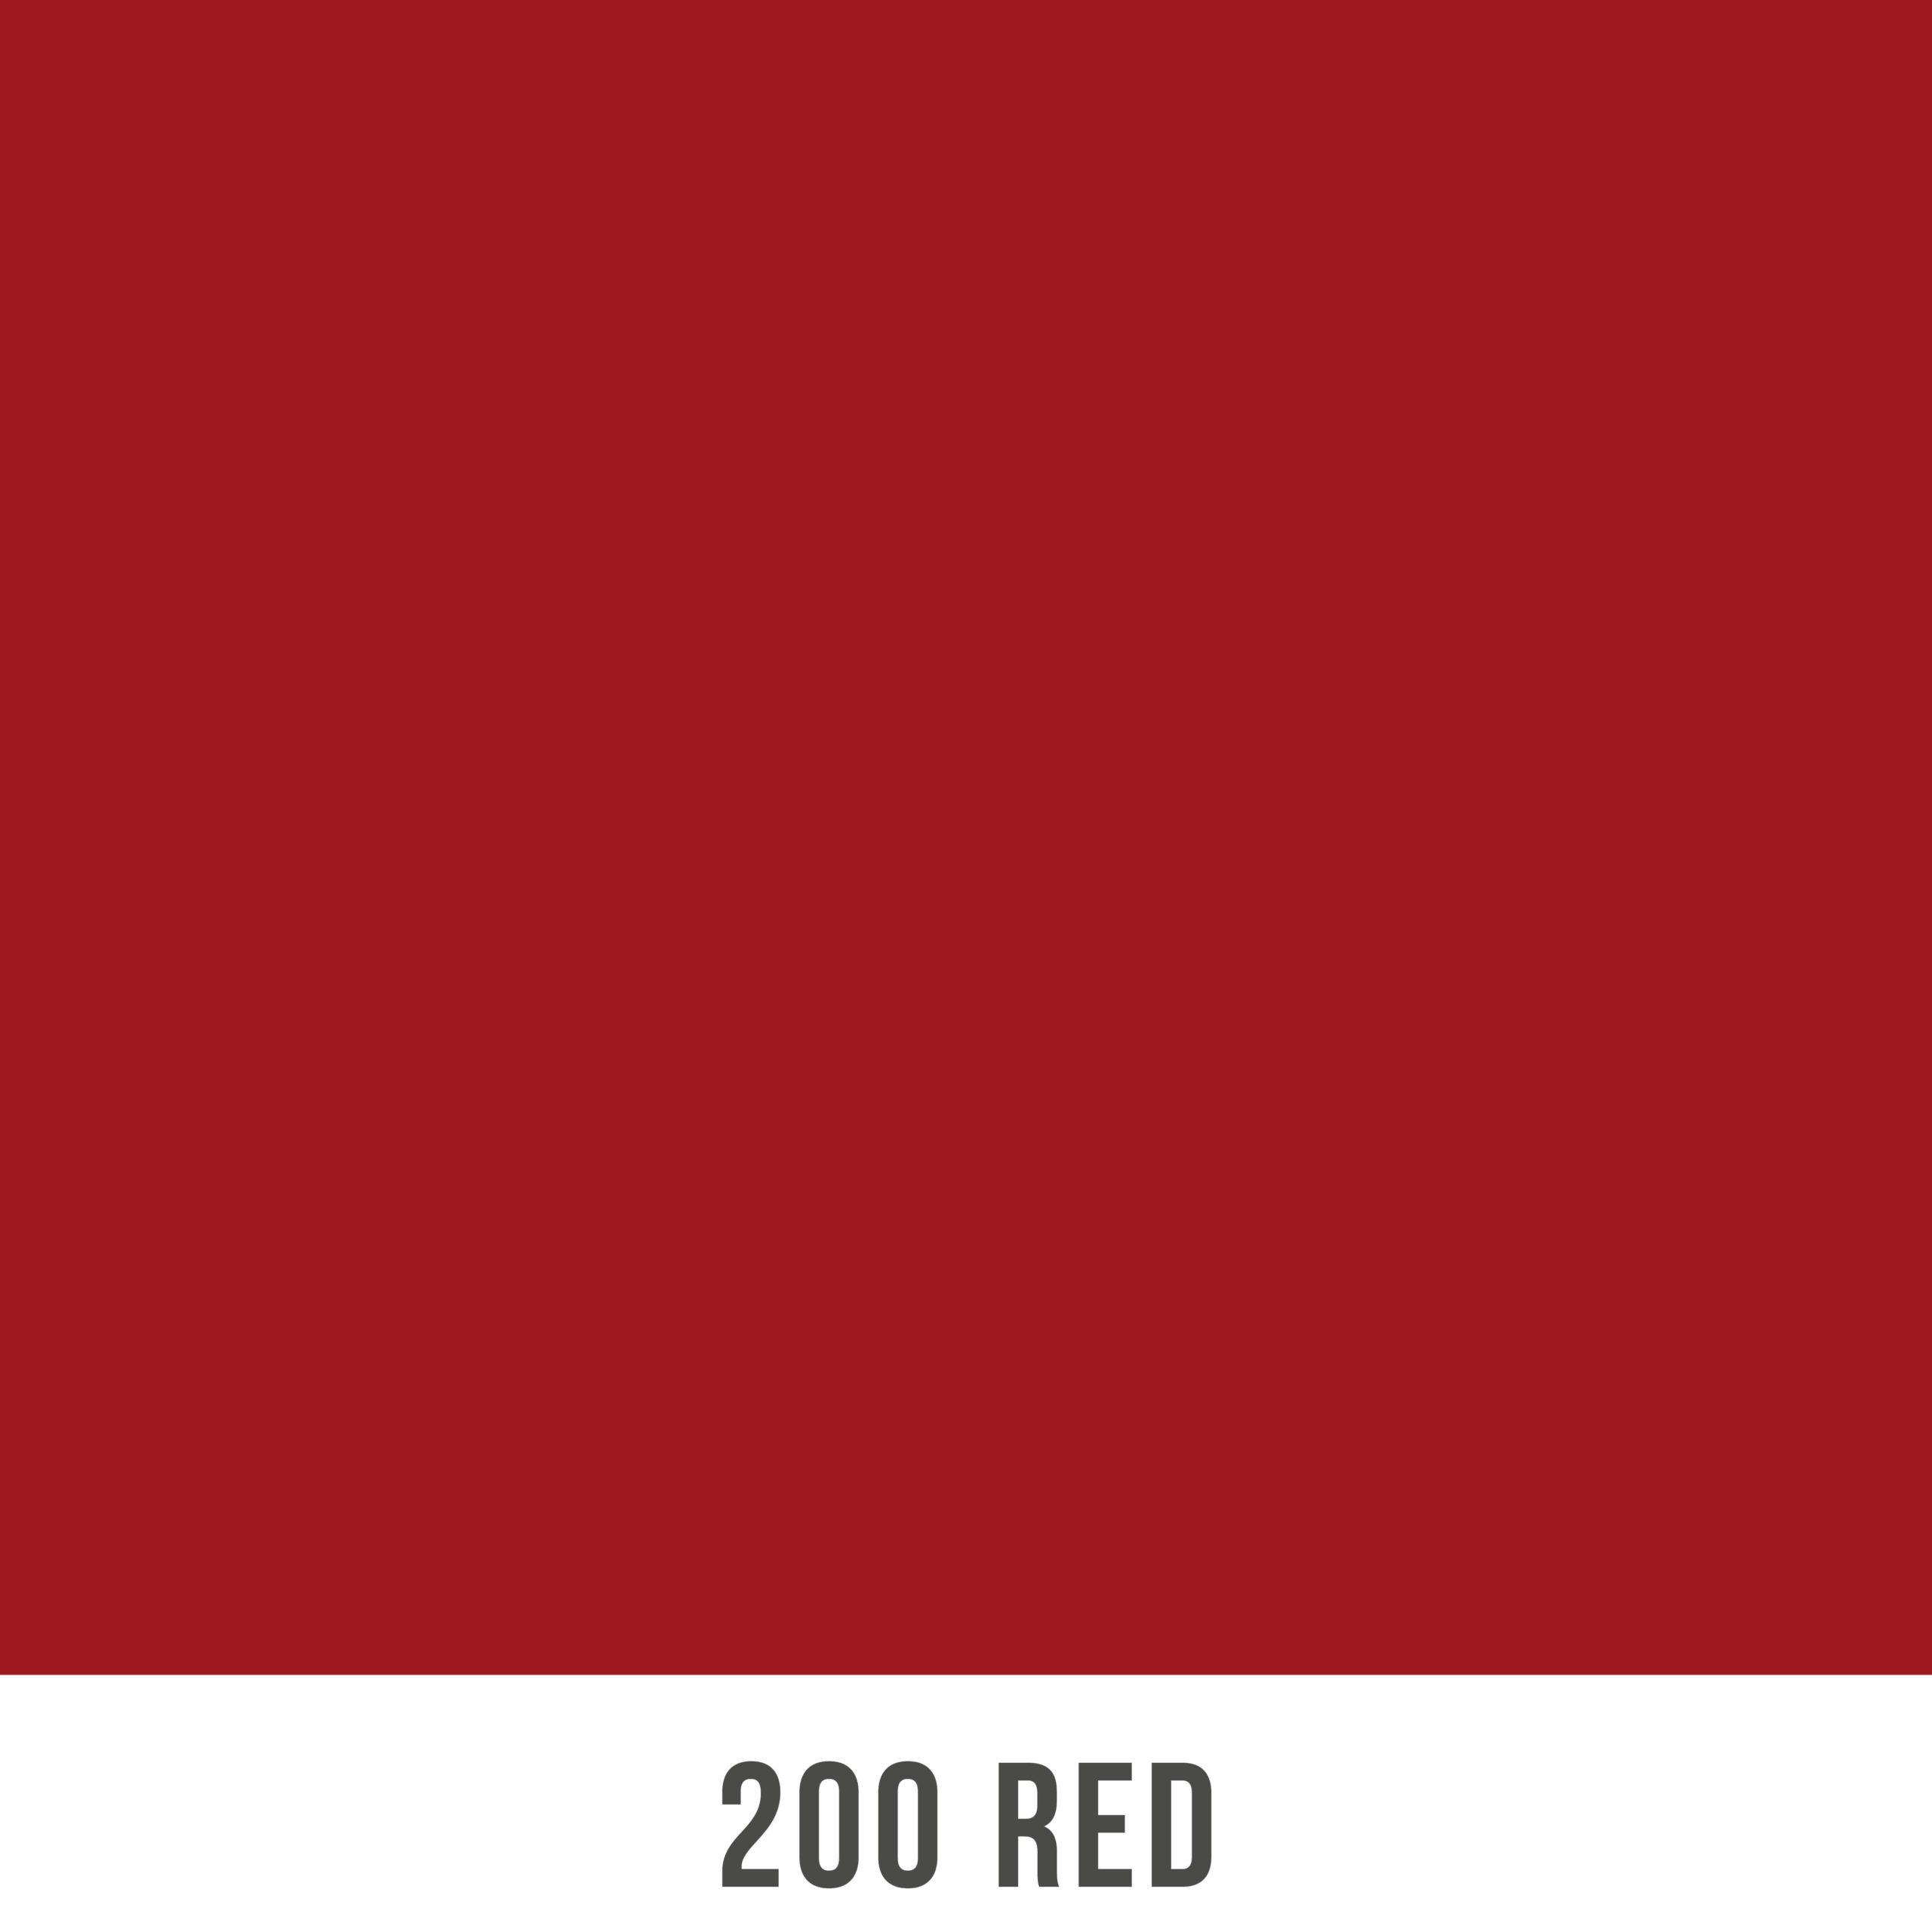 200 scaled